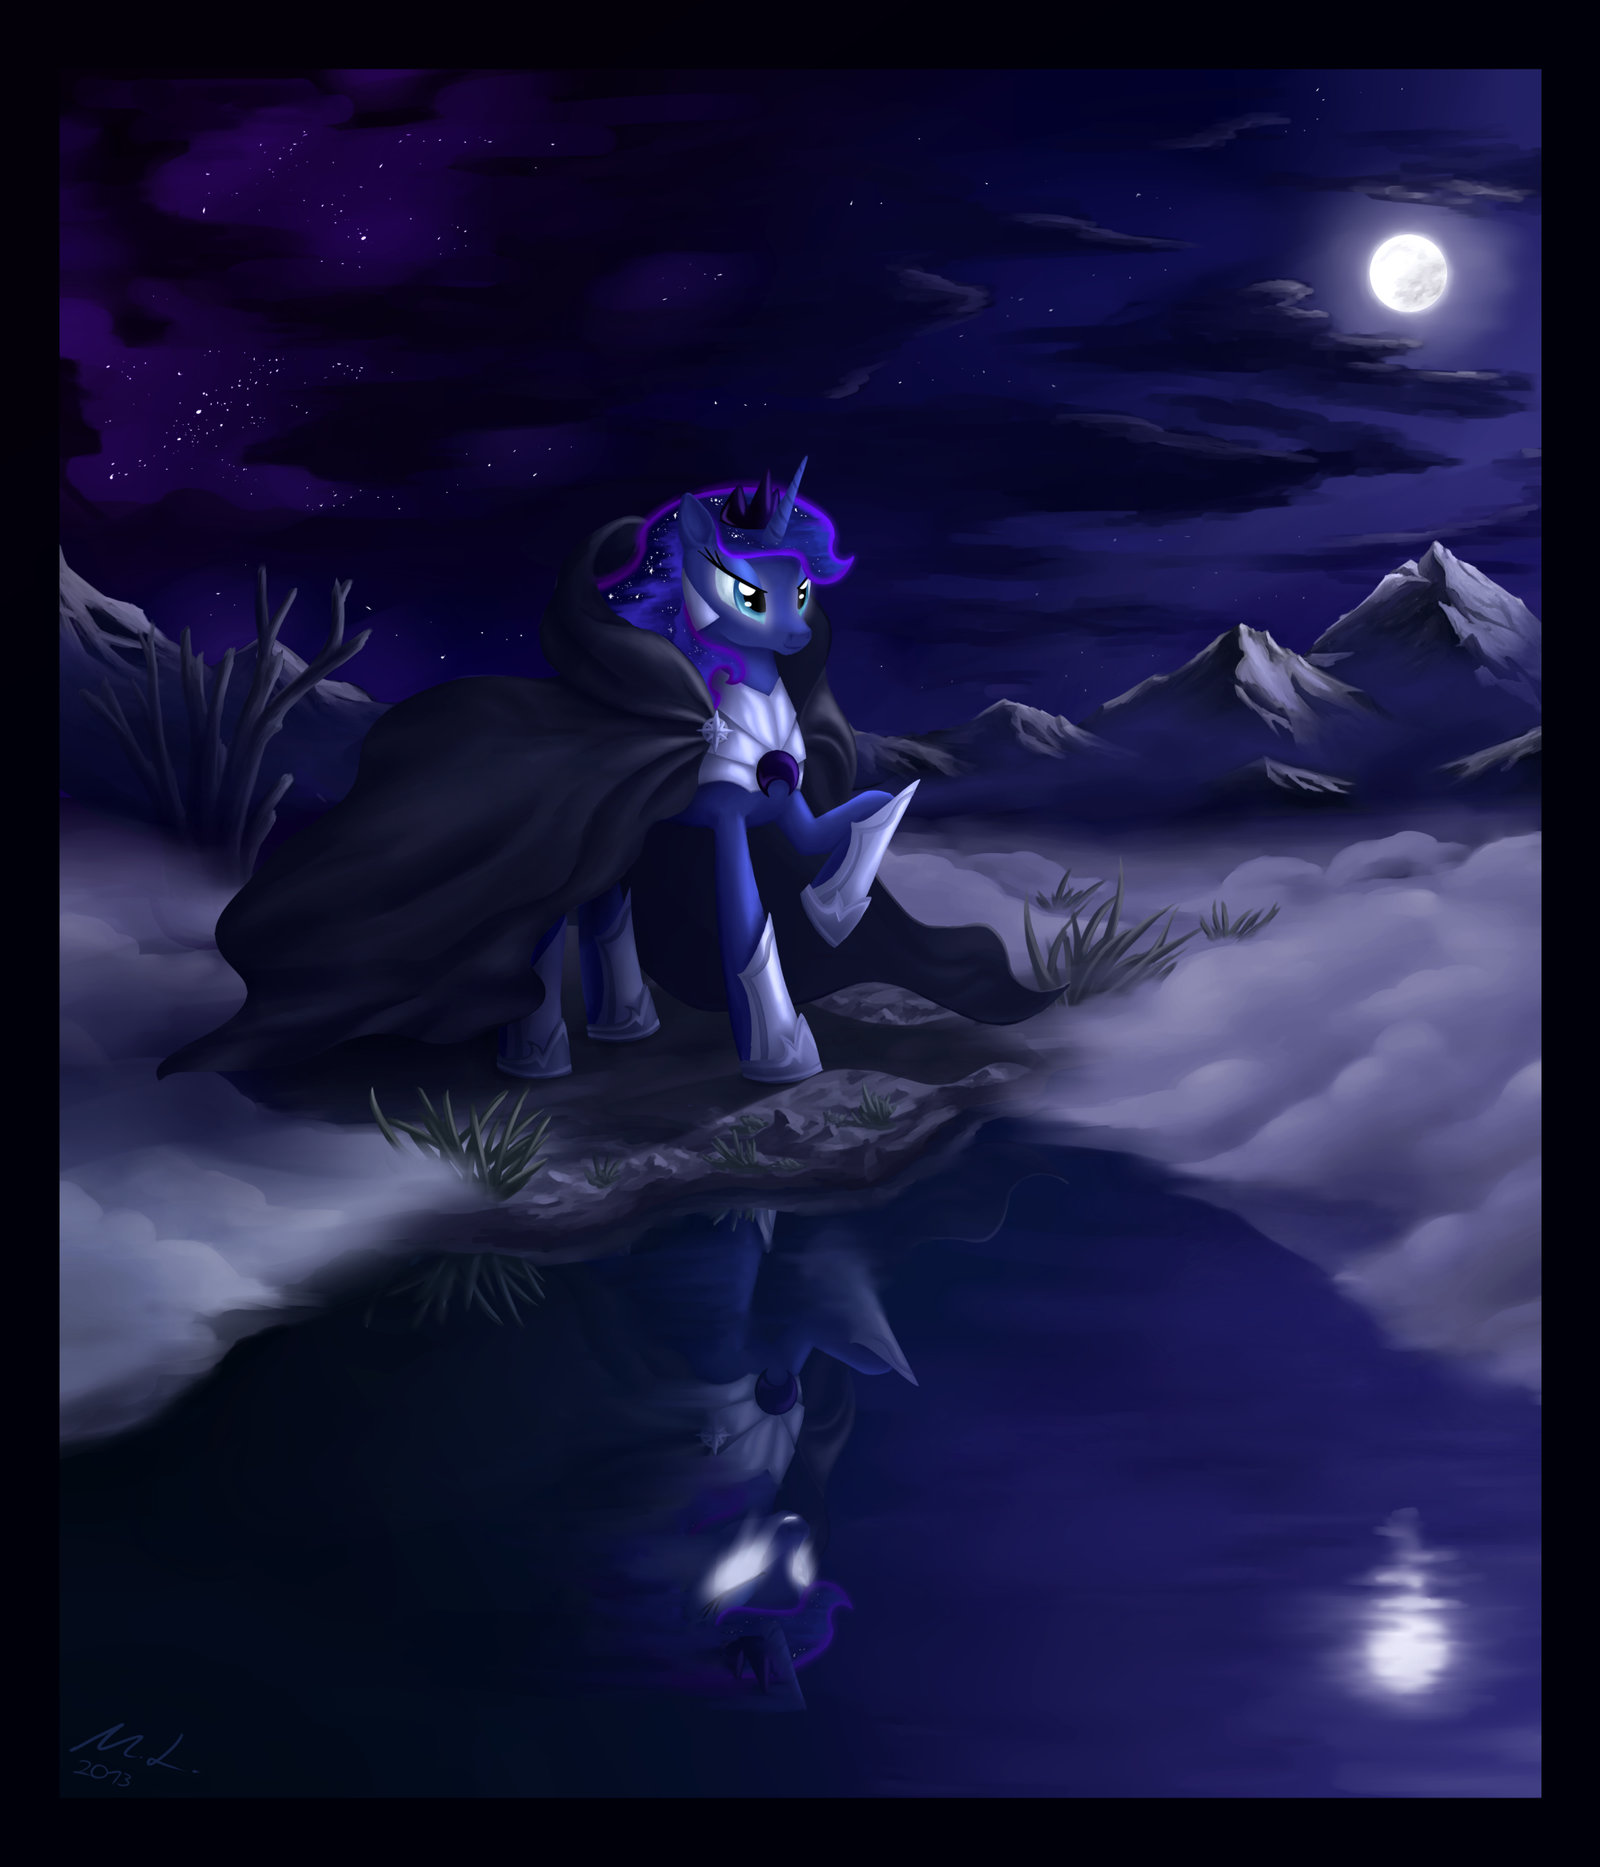 Ambassador of the Night by Cyberdrace